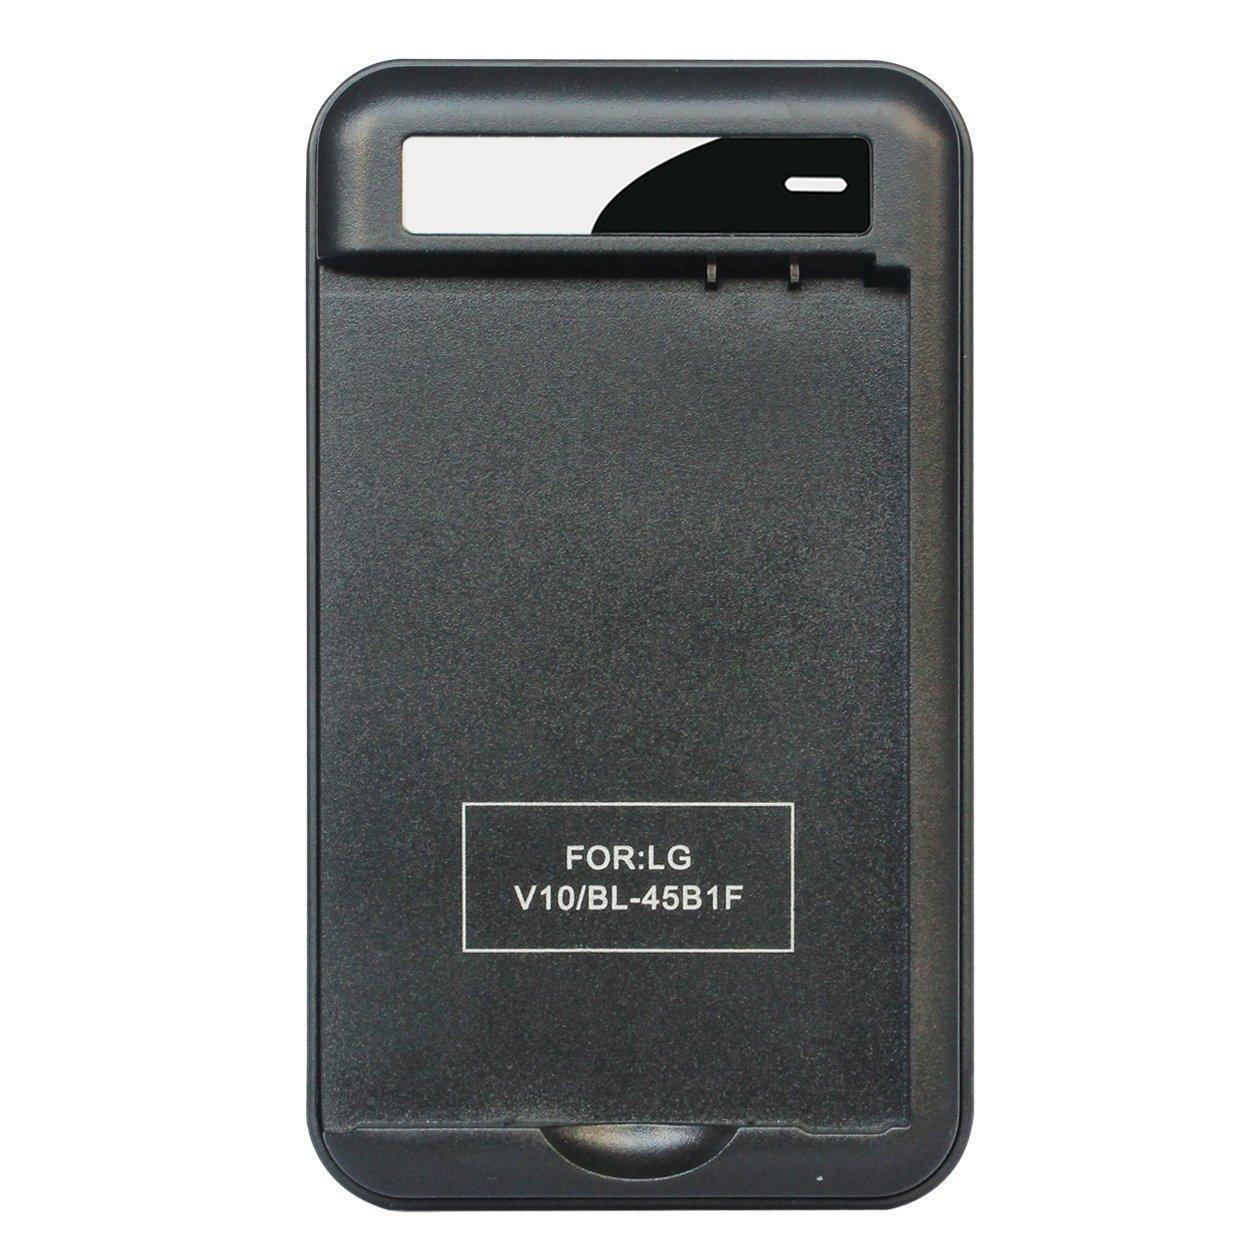 Bateria Celular LG V10 Specialized Charger: Lrker Specialized Intelligent Portable USB Travel Wall Charger para LG V10 P